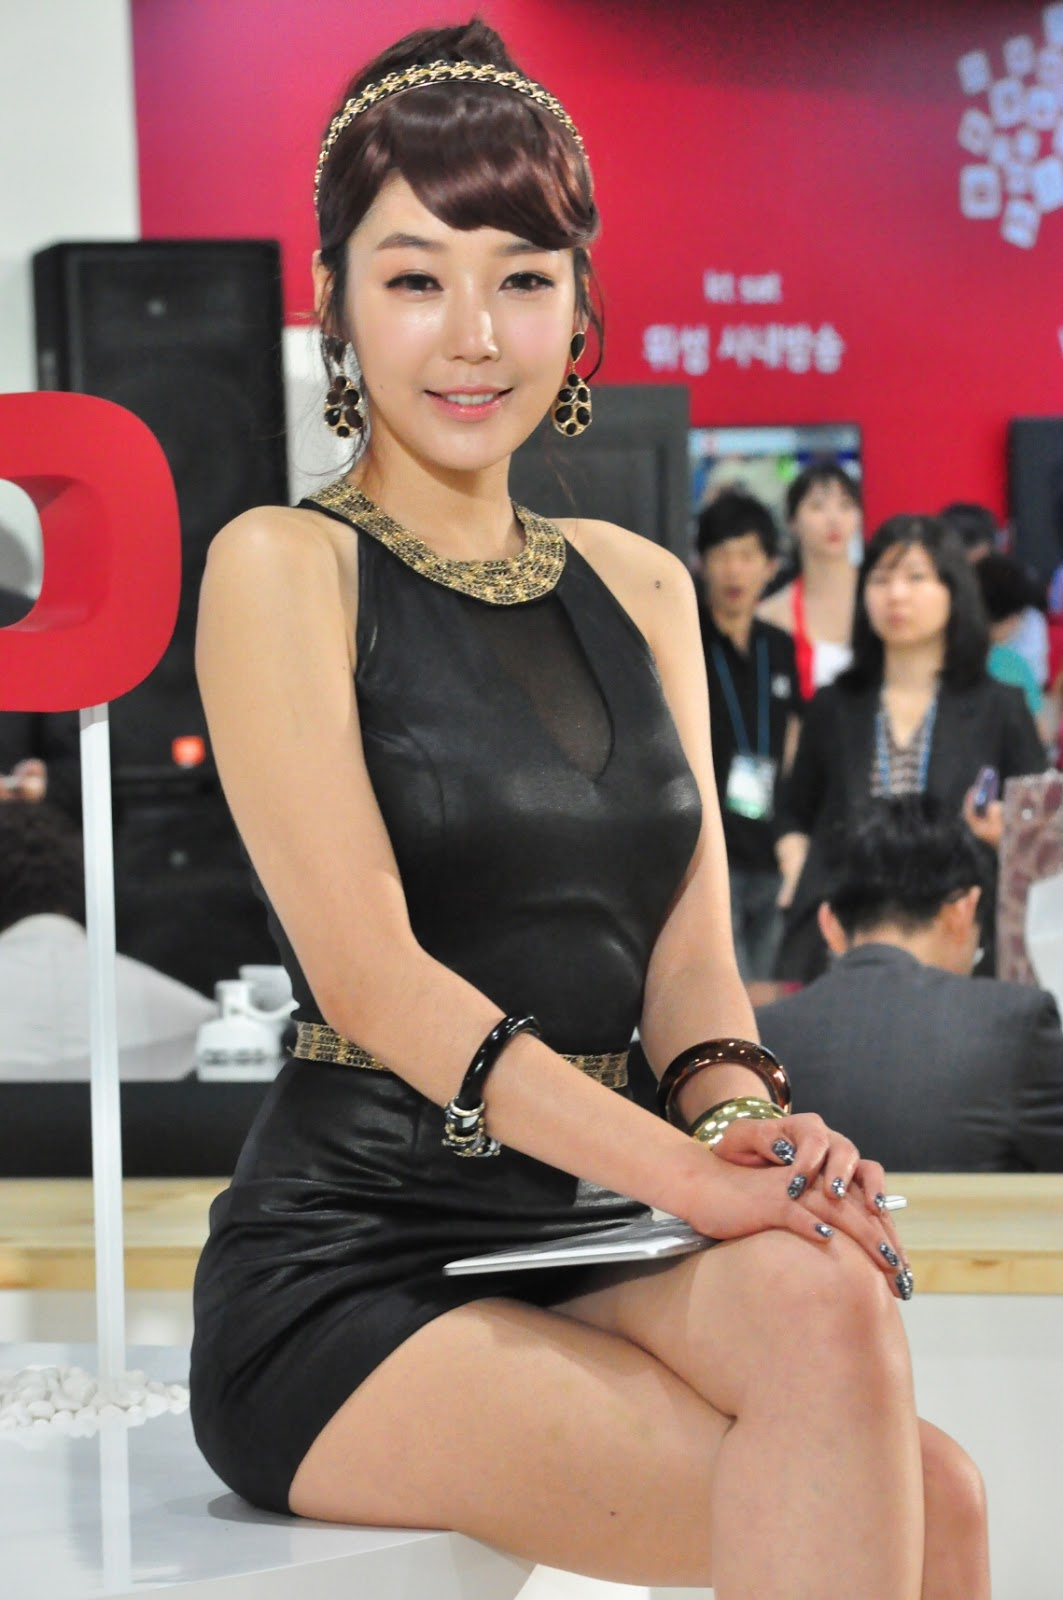 xxx nude girls: Jo Sang Hi - World IT Show 2012